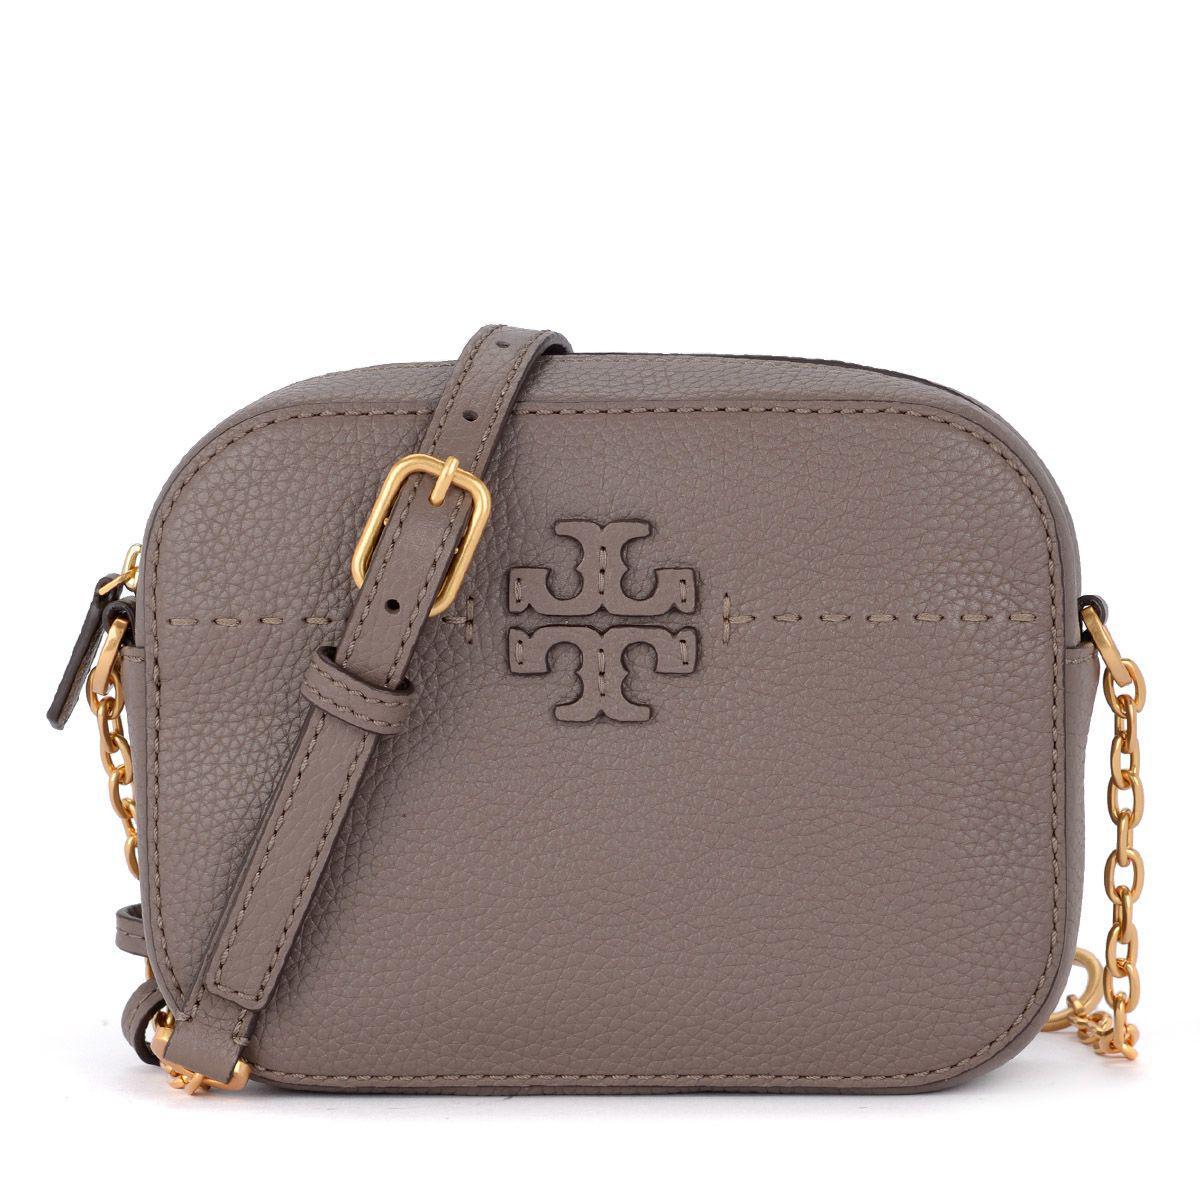 76600056de Tory Burch Mcgraw Grey Leather Shoulder Bag In Grigio   ModeSens